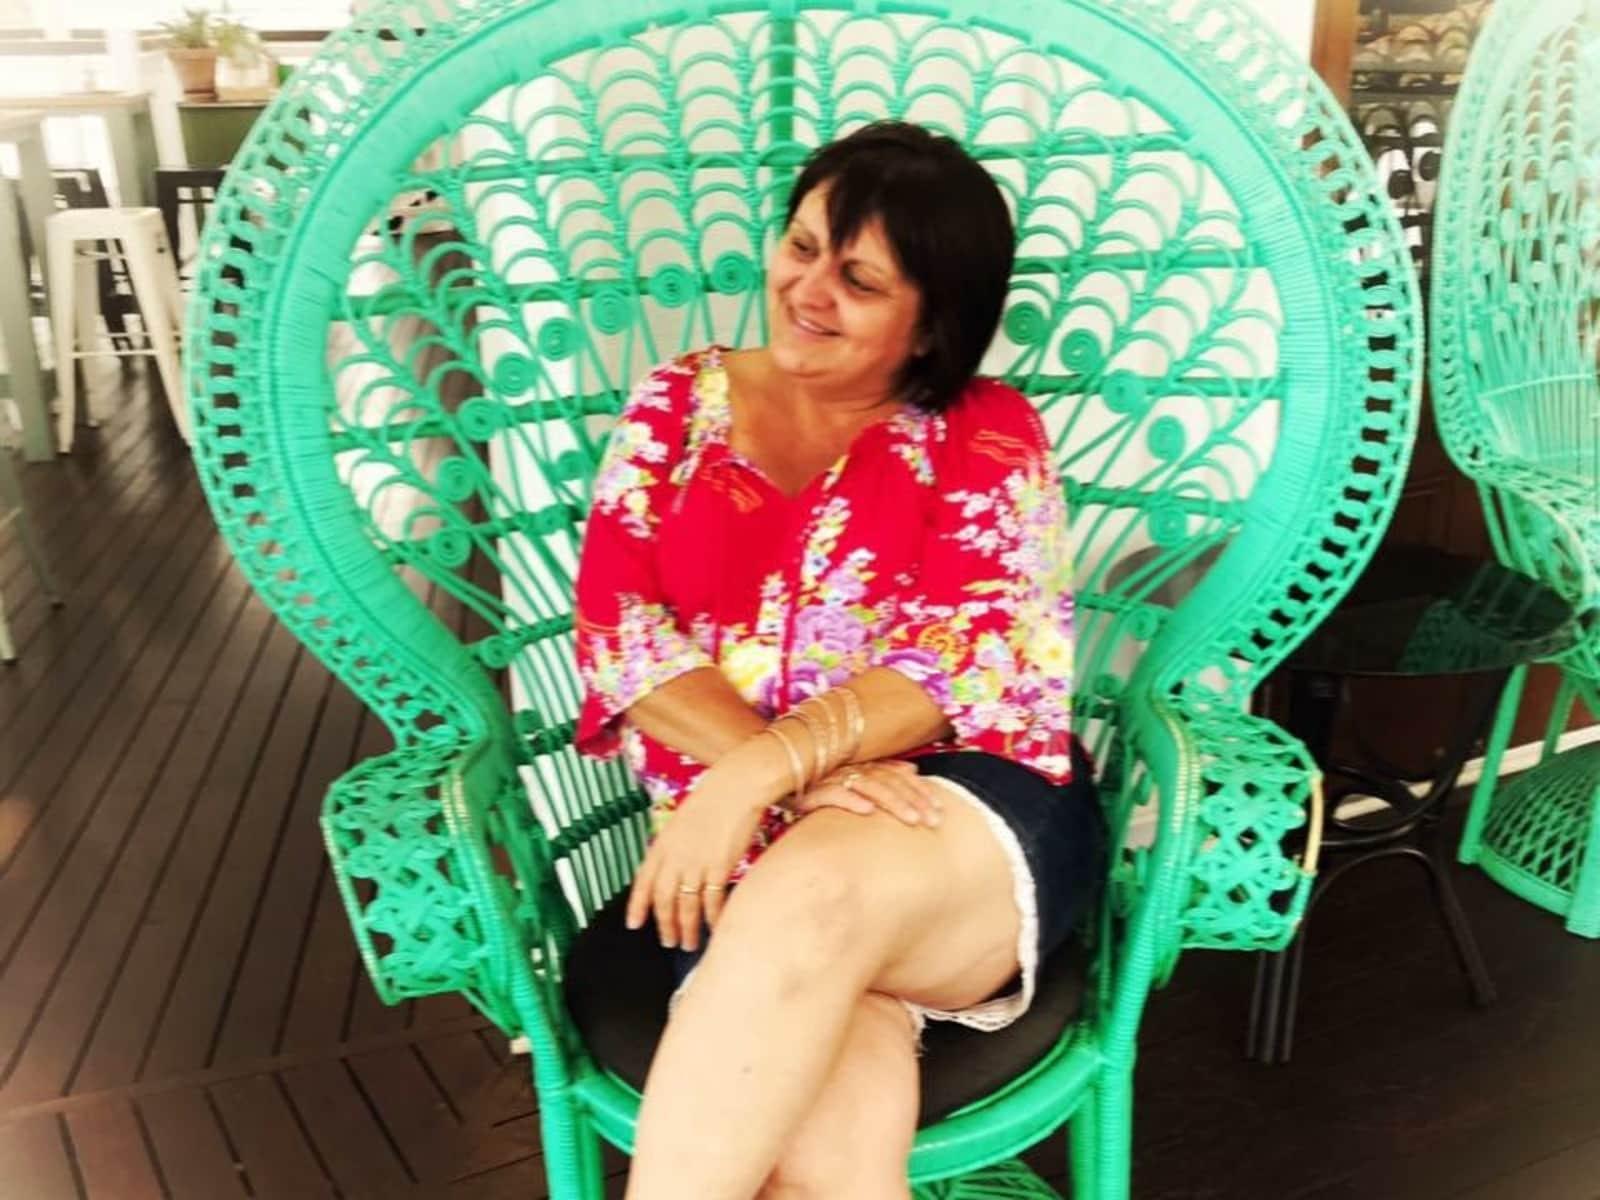 Kath from Cairns, Queensland, Australia